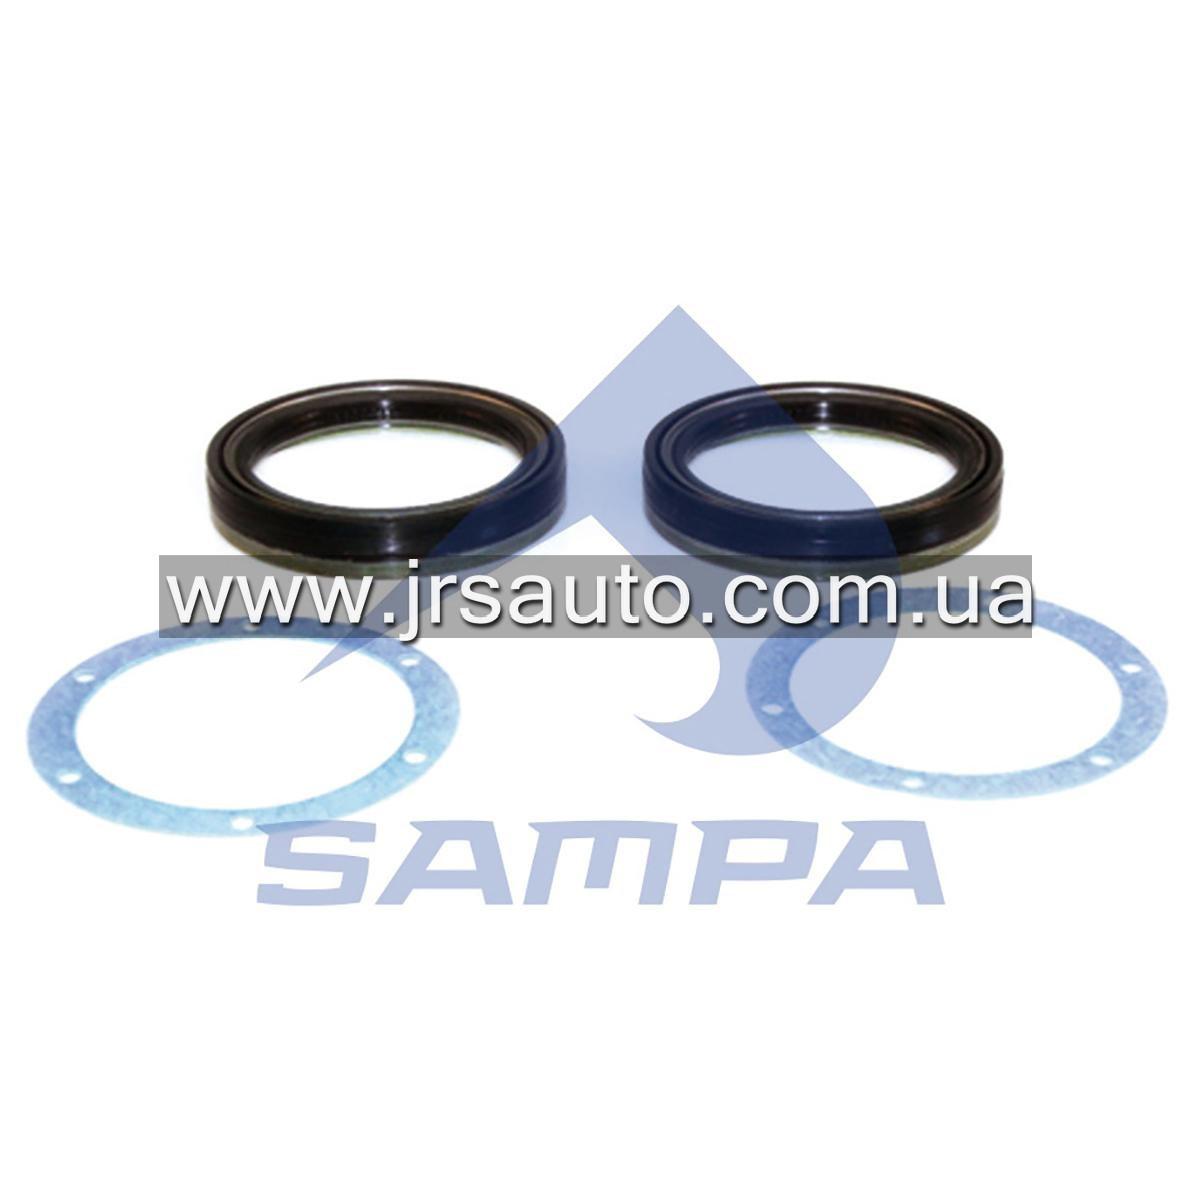 Комплект уплотнений ступицы ROR (d116,5xd152,5x25,5) \AXL103 \ 085.524